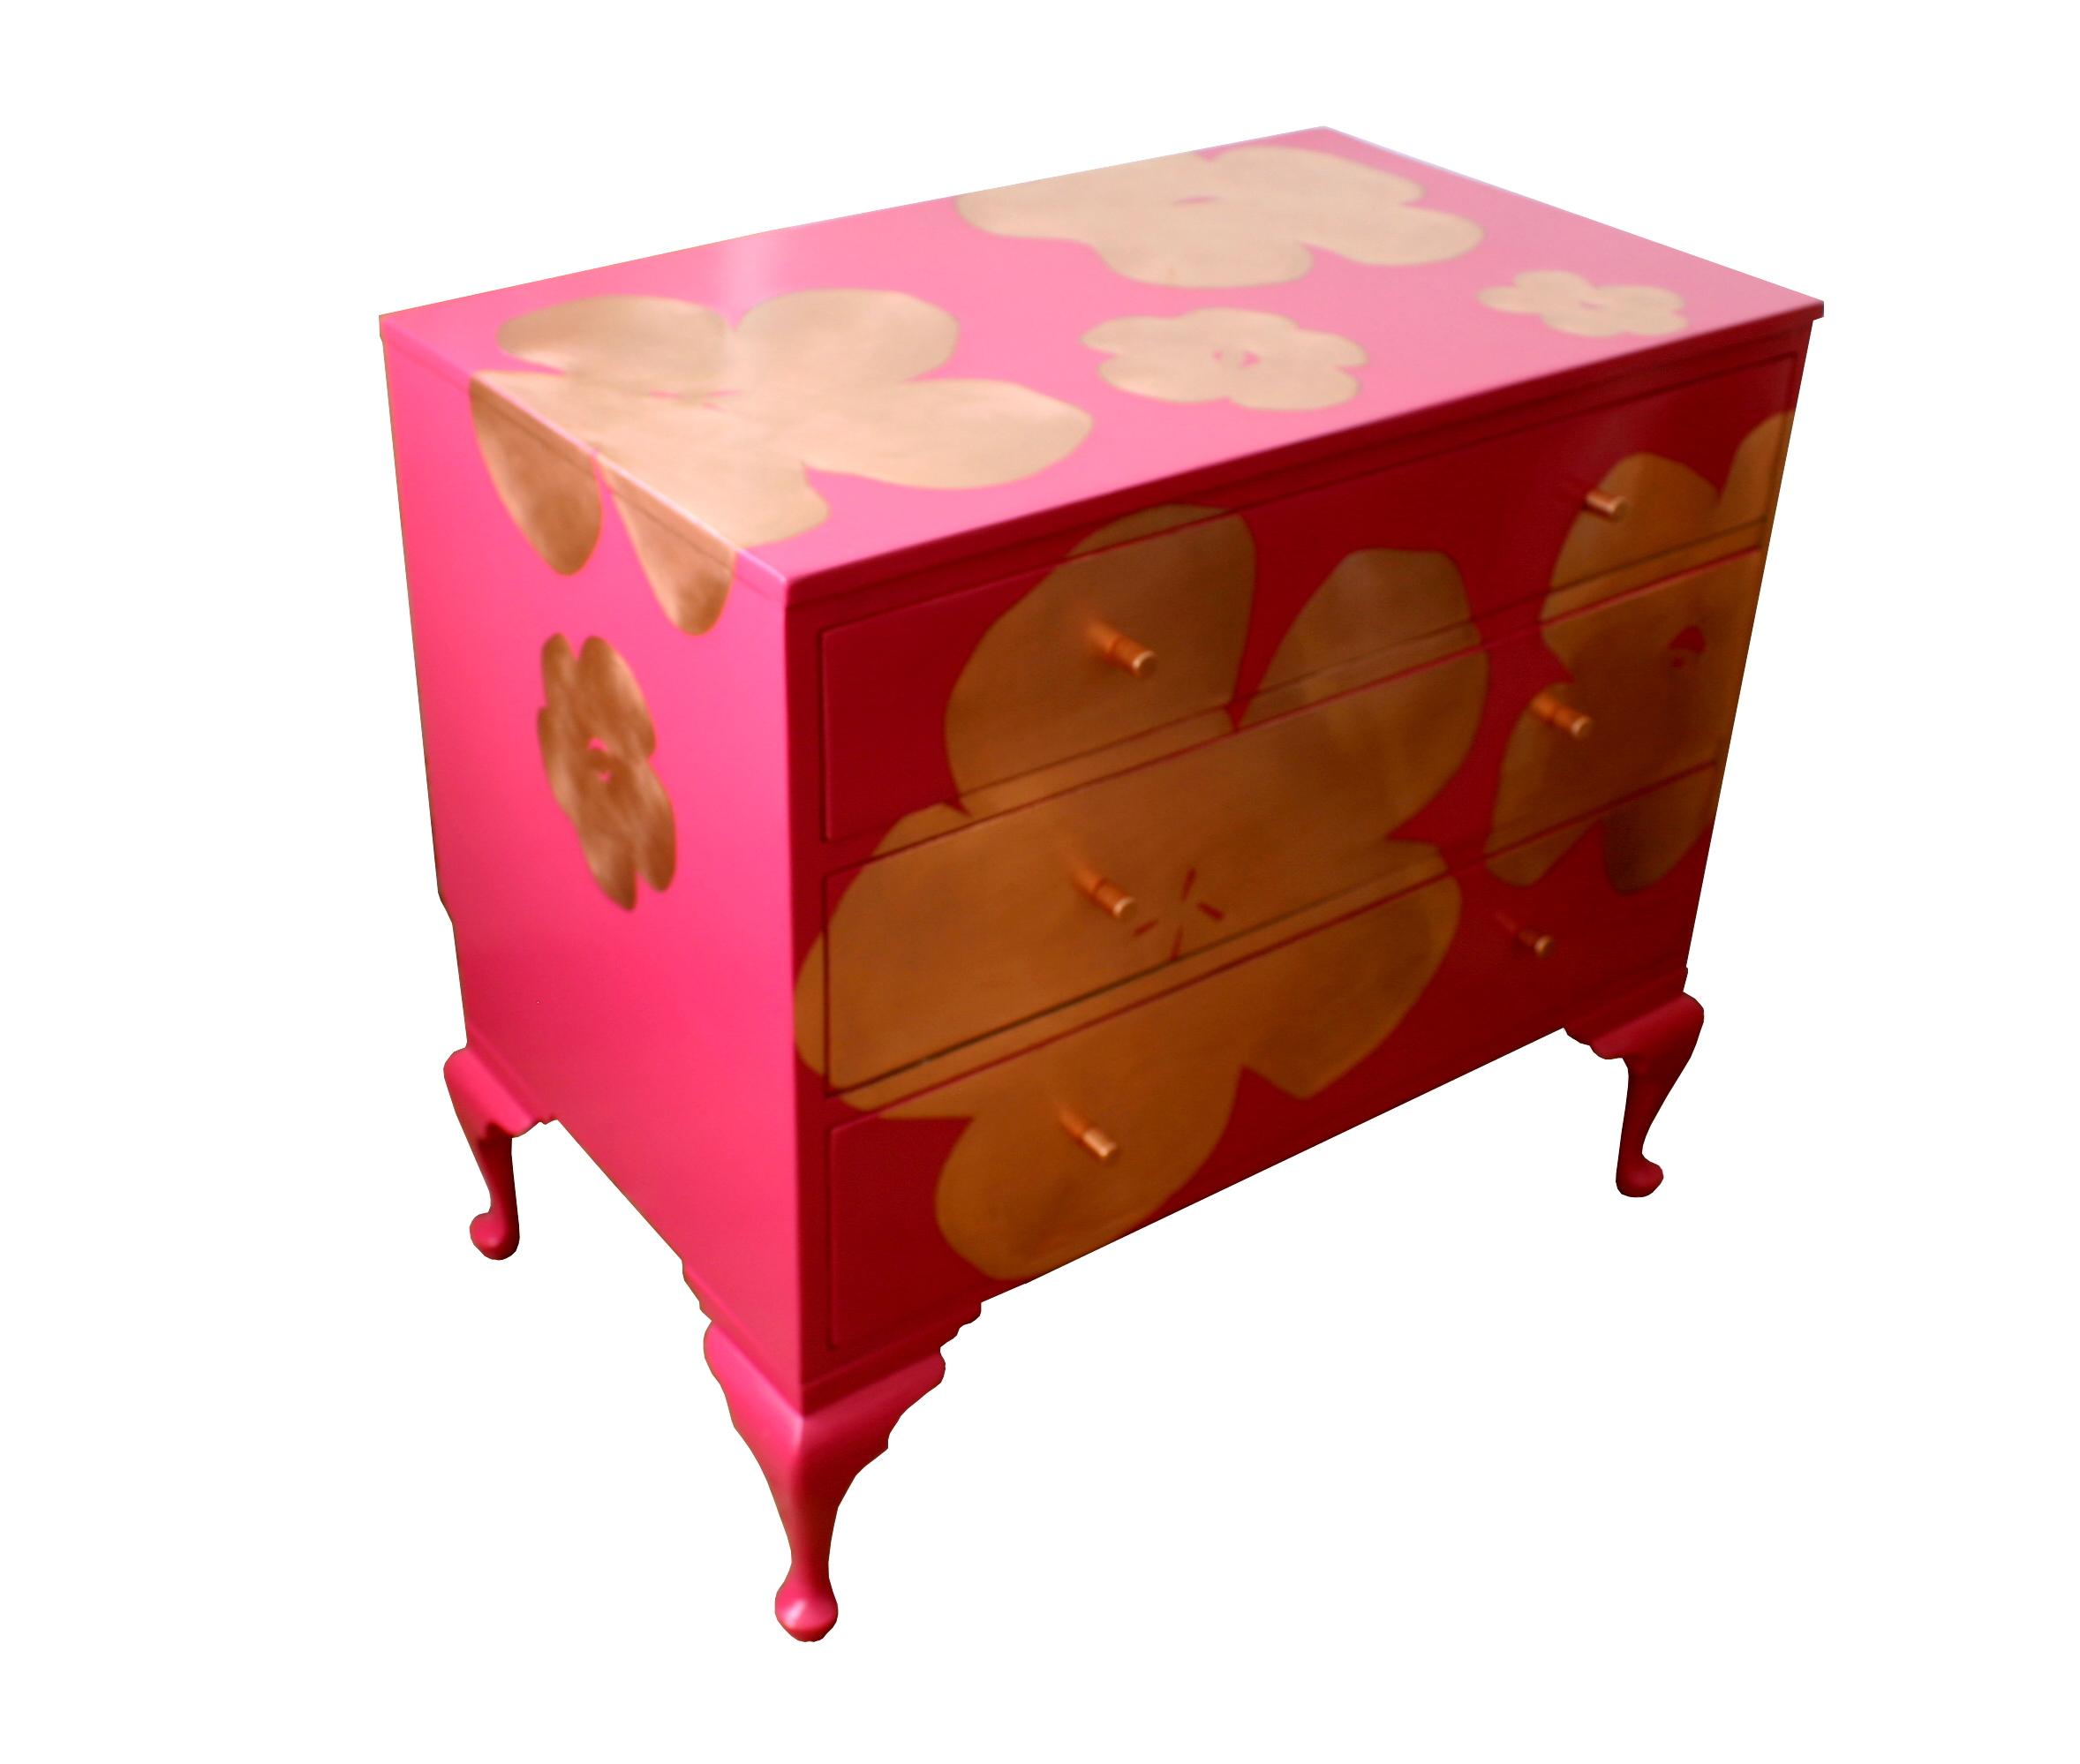 'Poppy' in pink